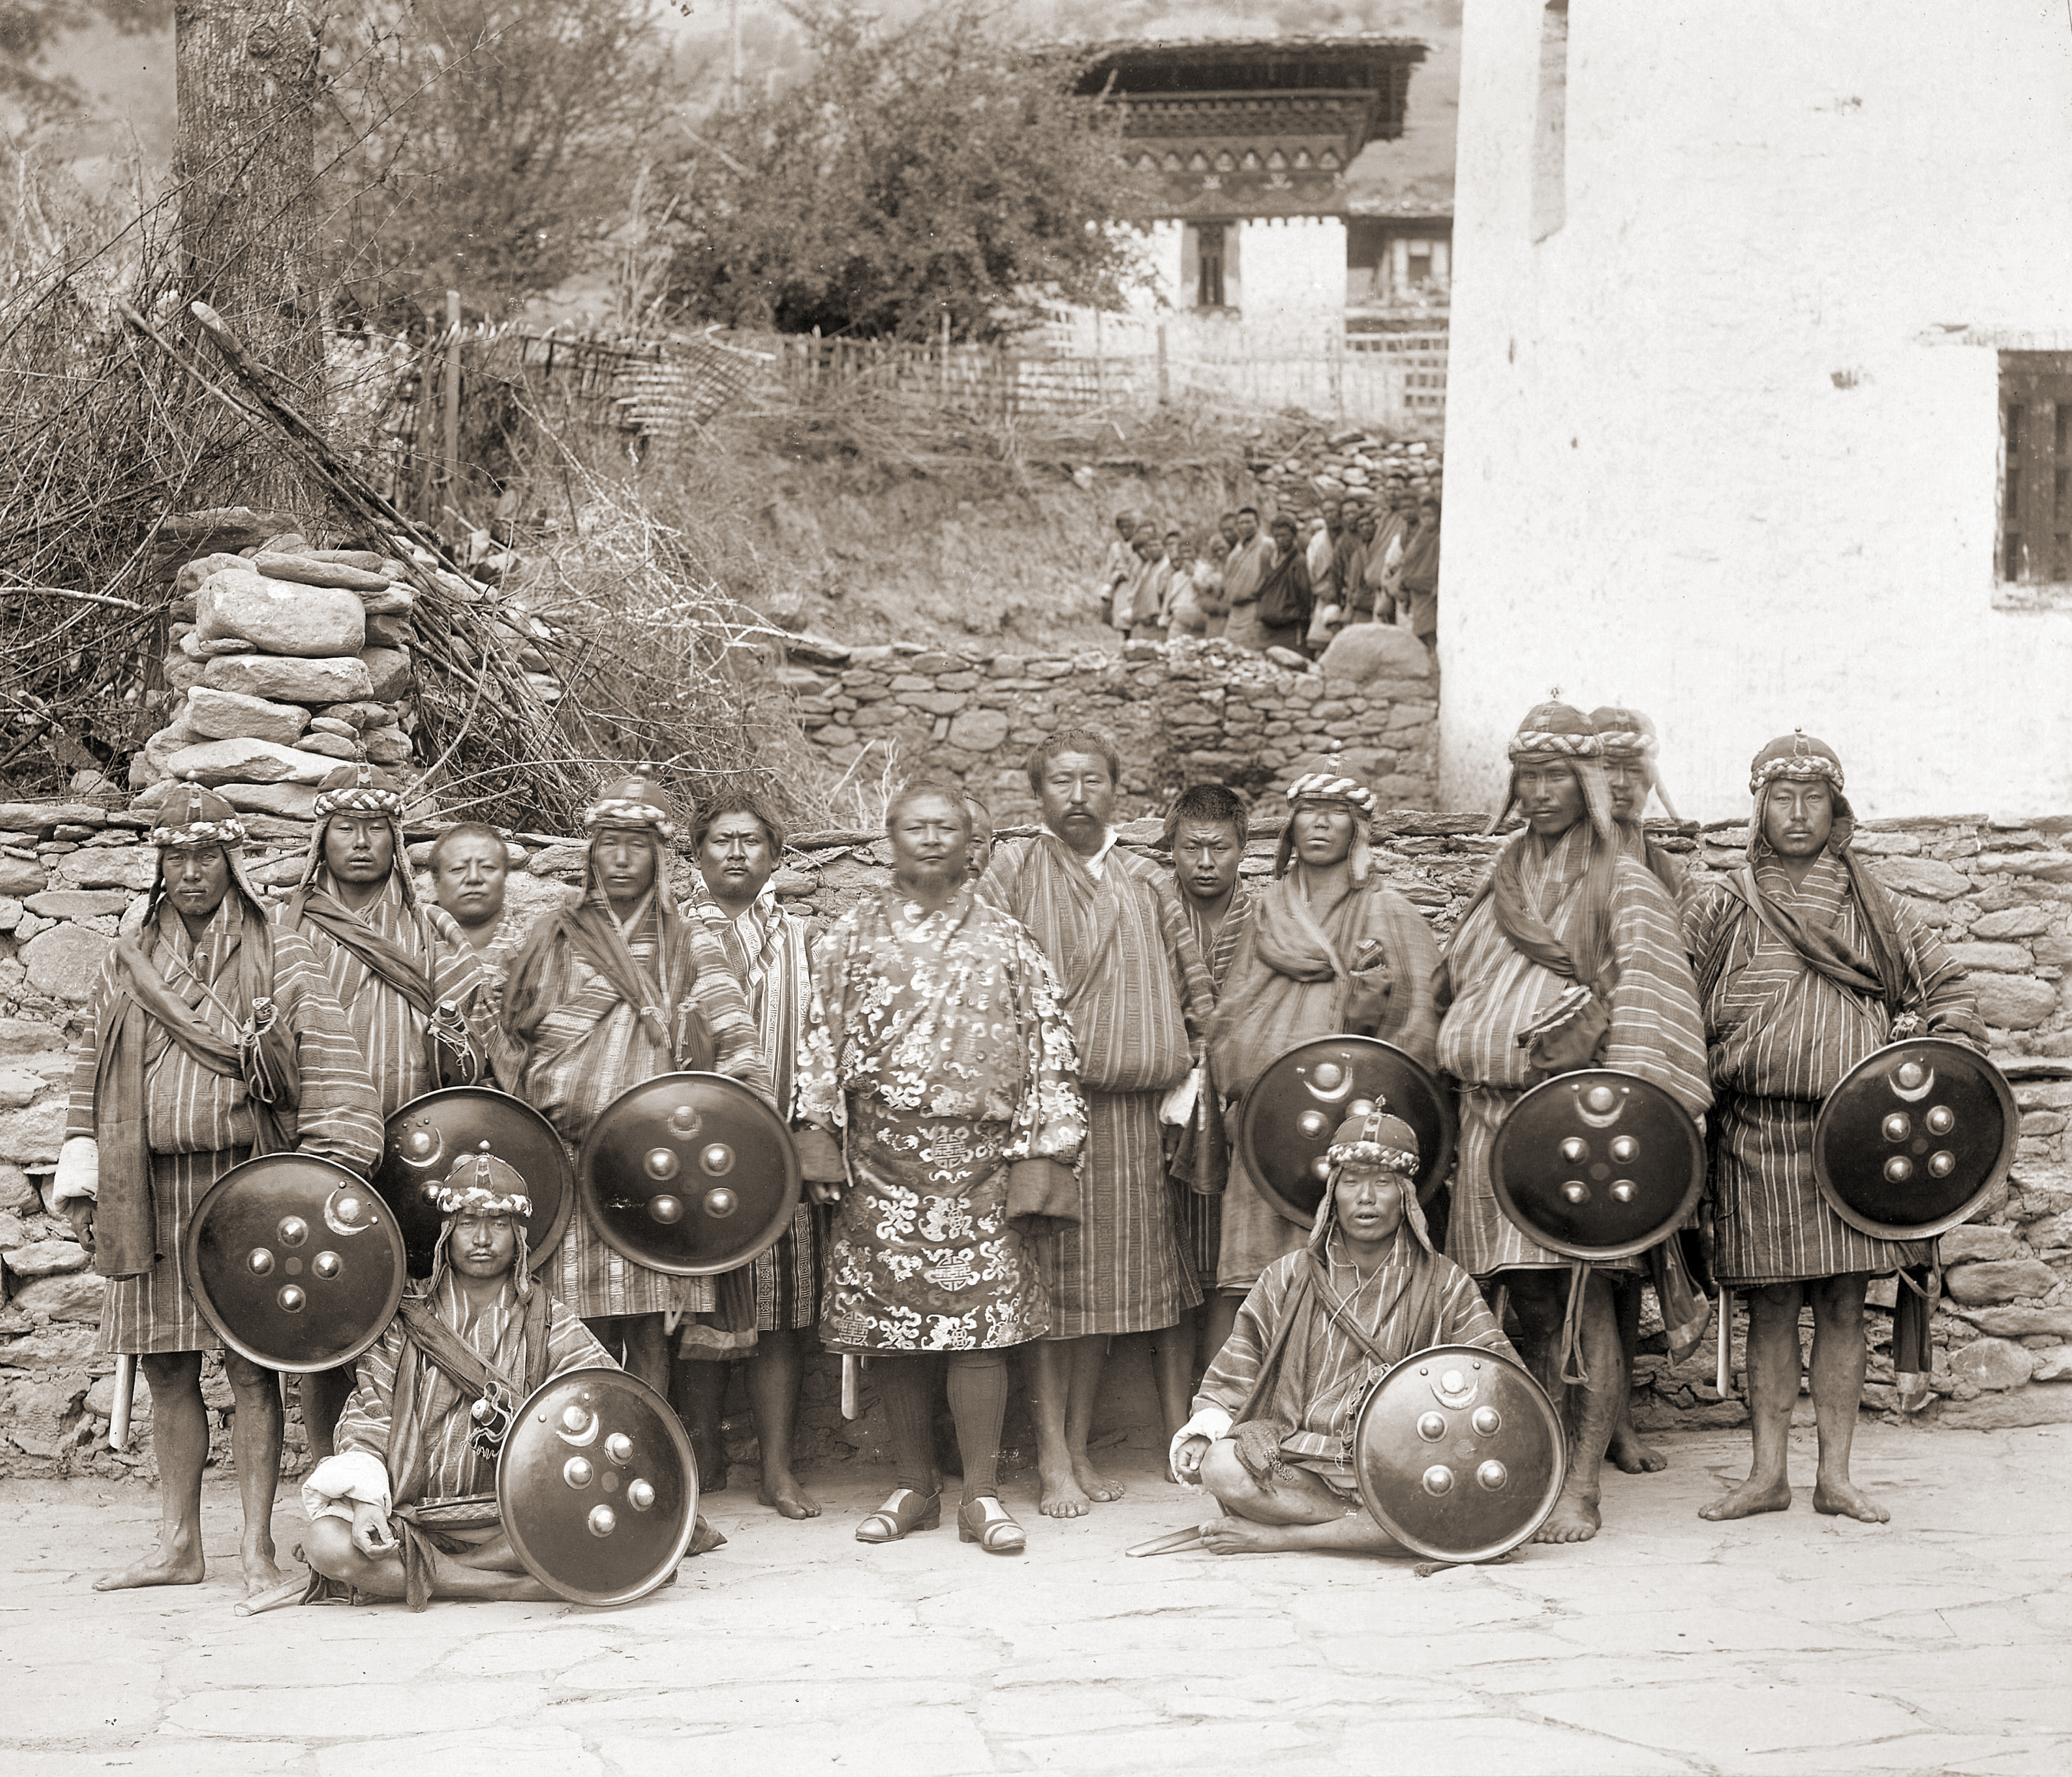 https://upload.wikimedia.org/wikipedia/commons/9/9d/Sir_Ugyen_Wangchuck%2C_with_his_bodyguards%2C_Tongsa_Dzong_in_Bhutan%2C_1905.jpg